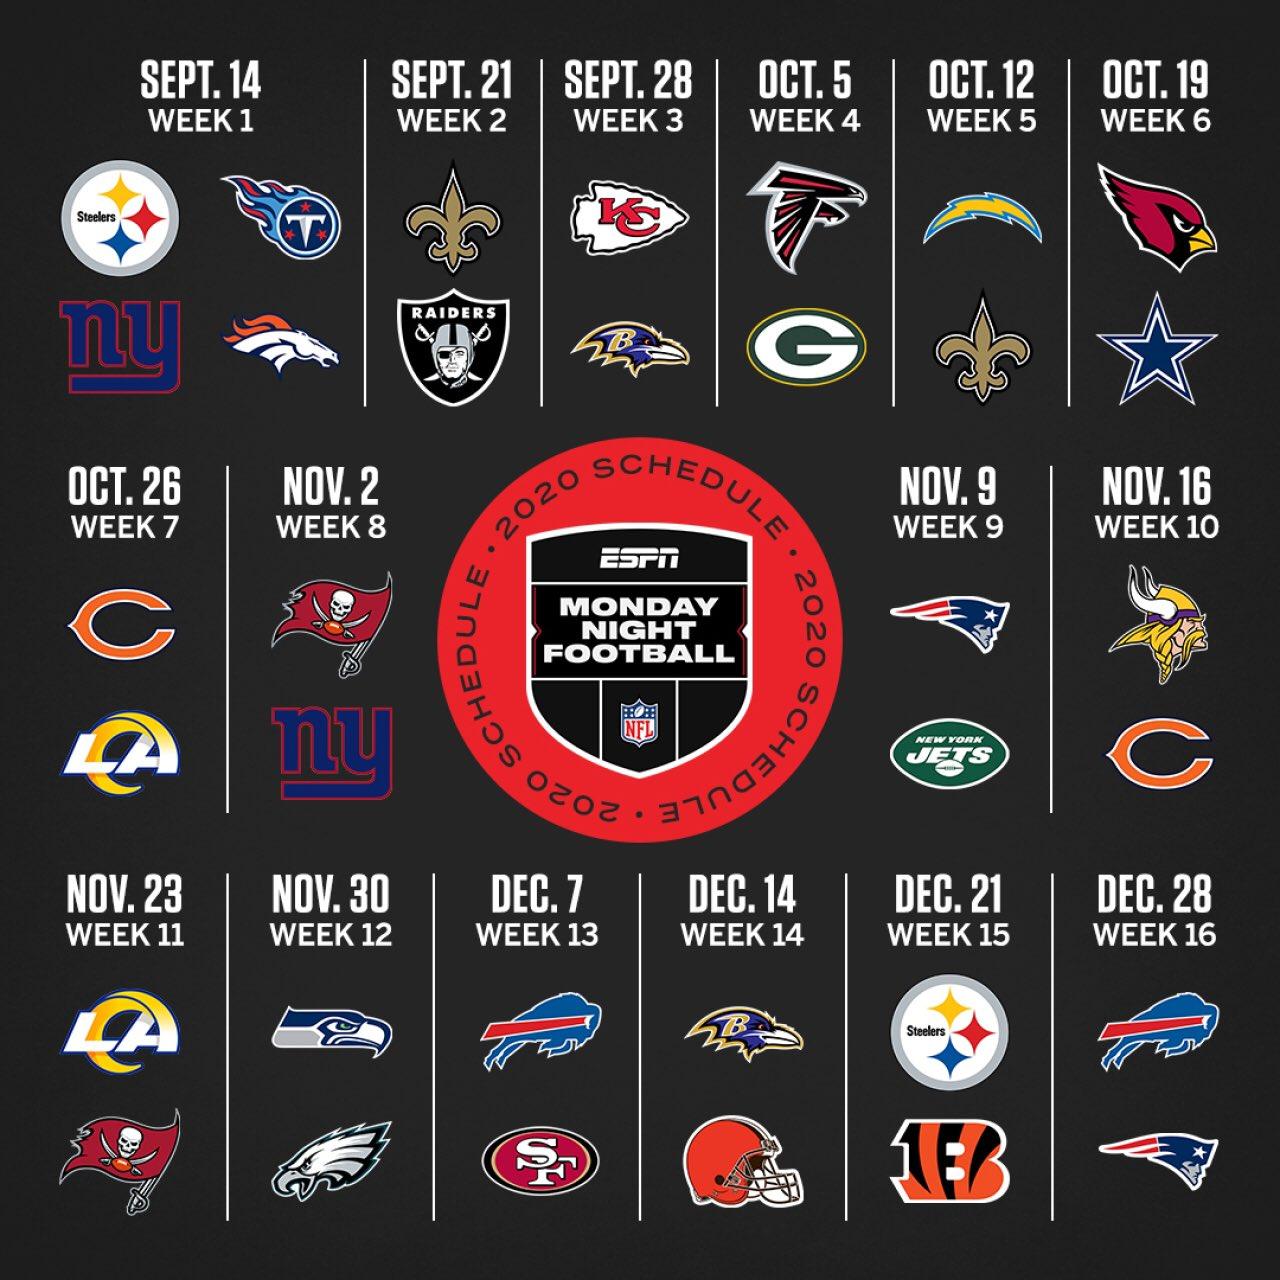 Adam Schefter On Twitter The Monday Night Football Schedule For The 2020 Season